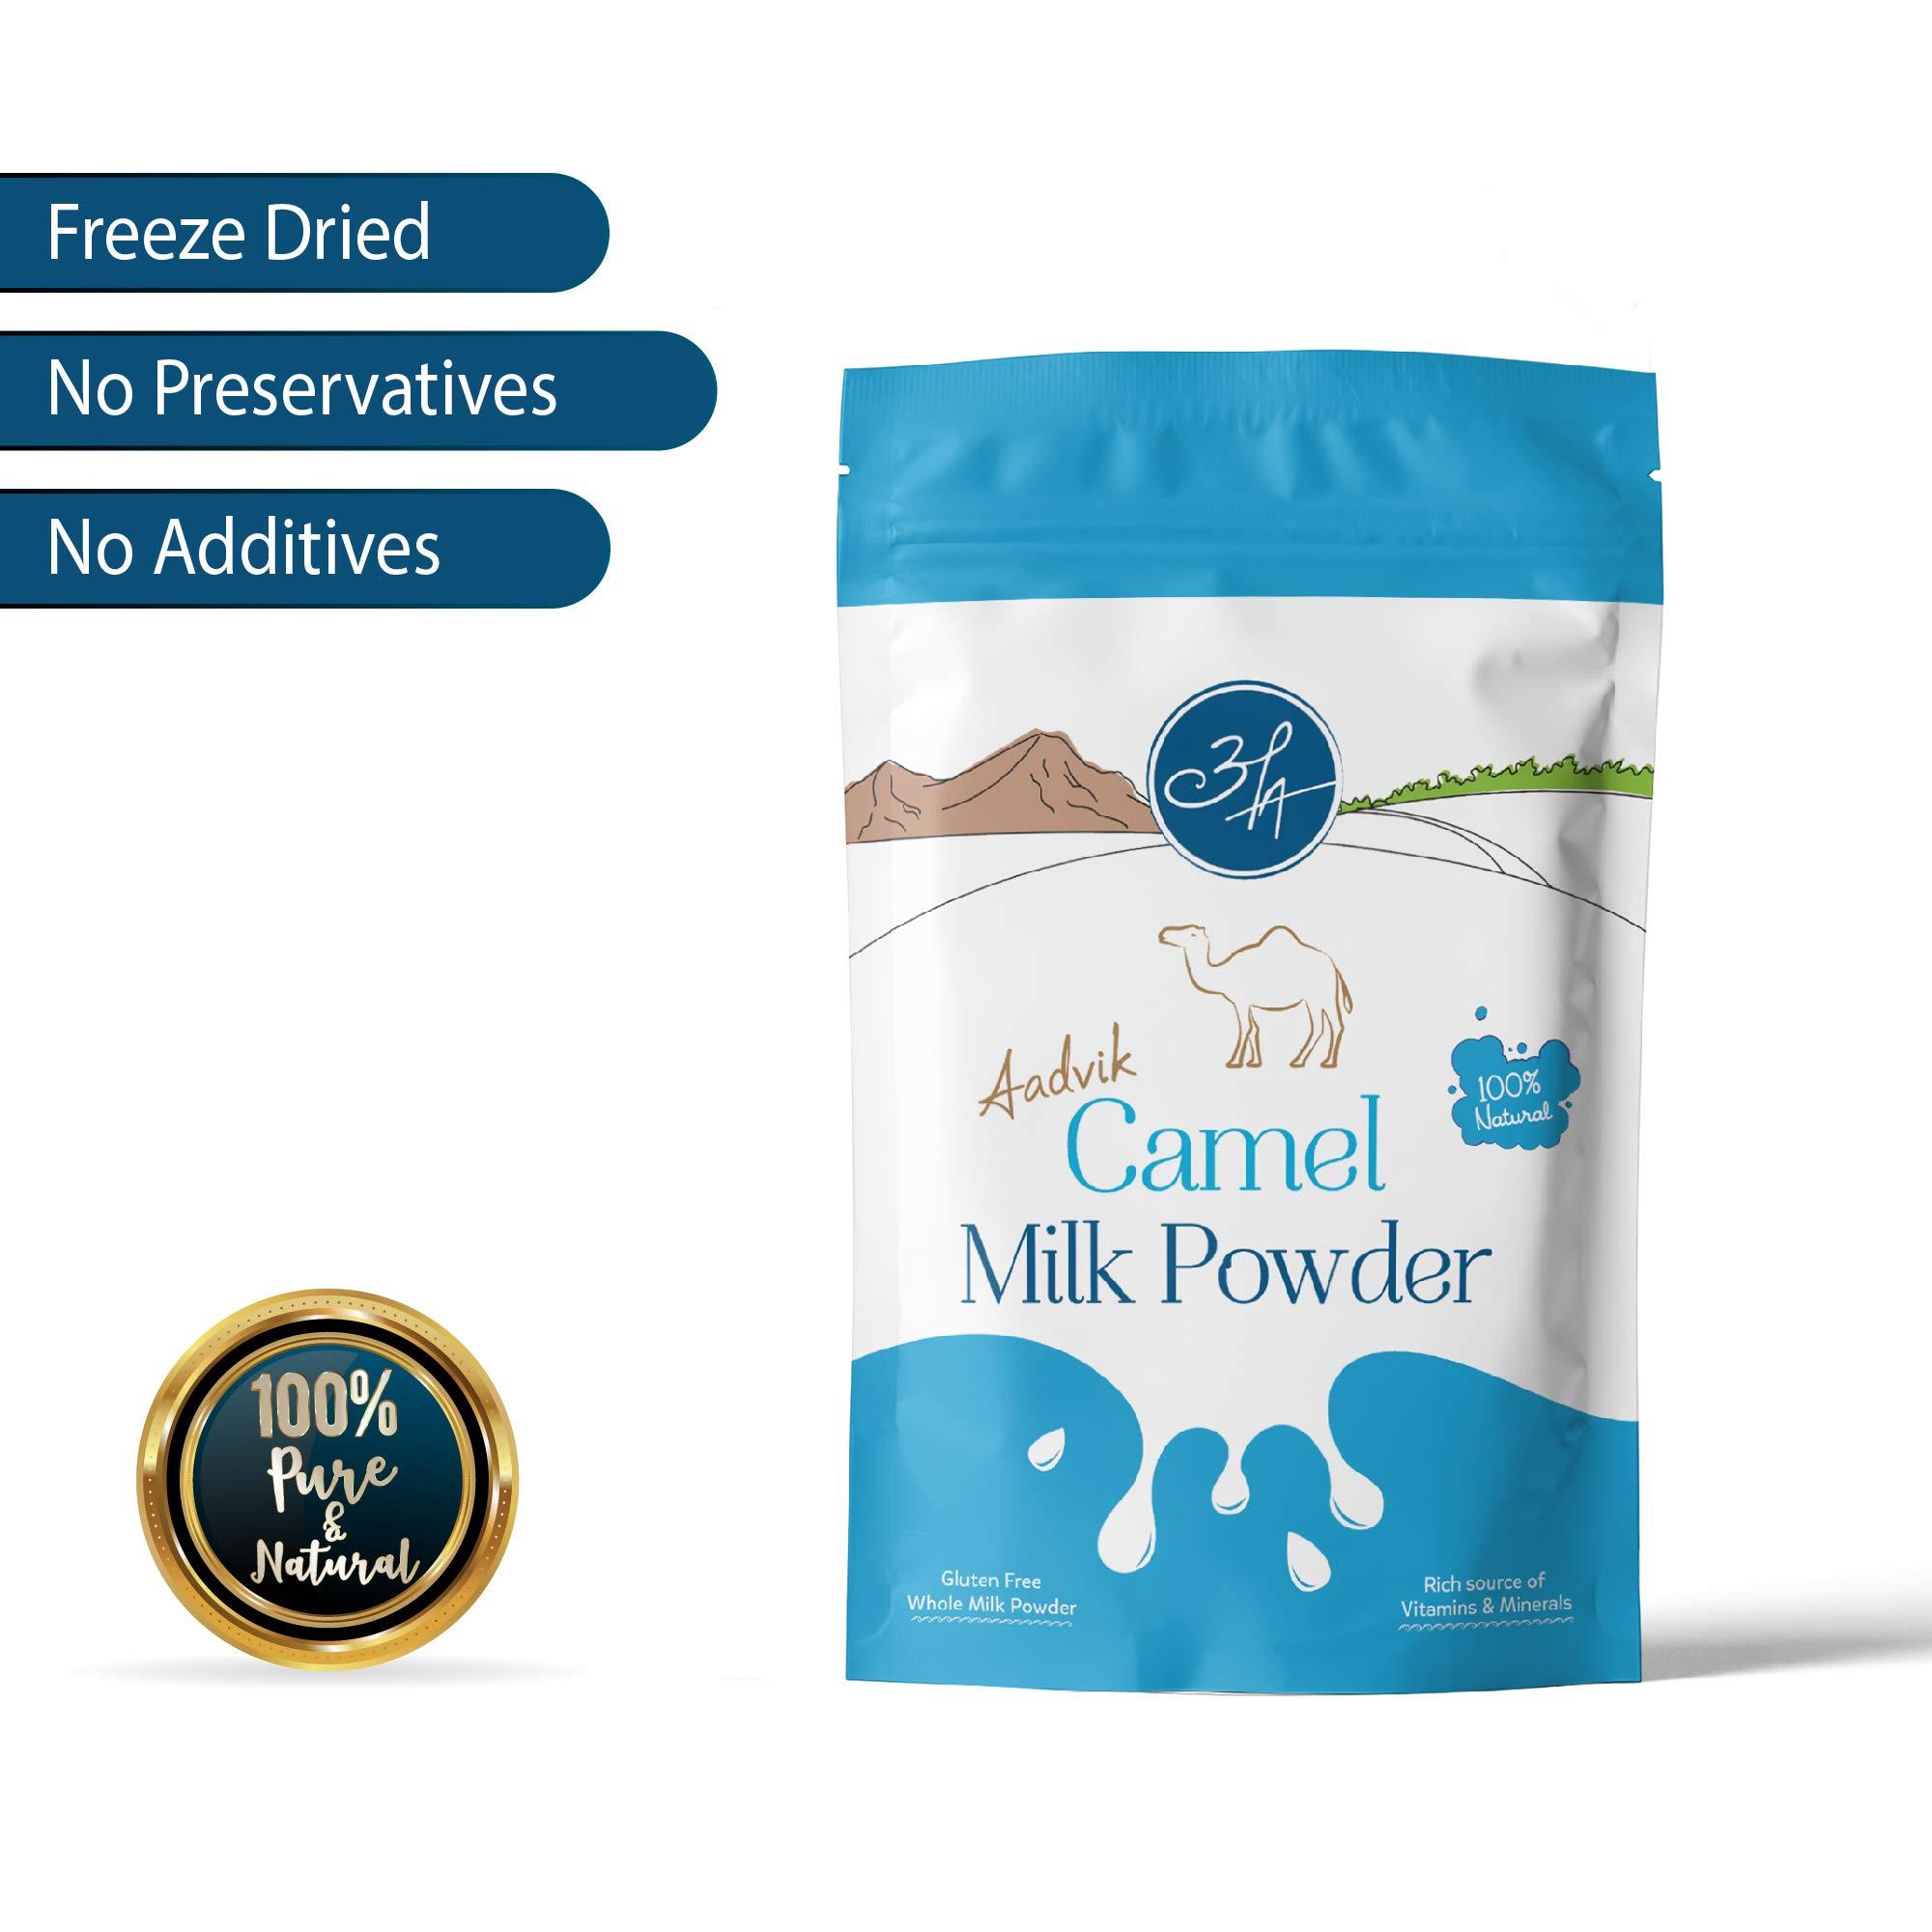 Aadvik Camel Milk Powder 17.5 Oz (Freeze Dried, Gluten Free, No Additives) 25 servings, makes 175 fl oz by Aadvik